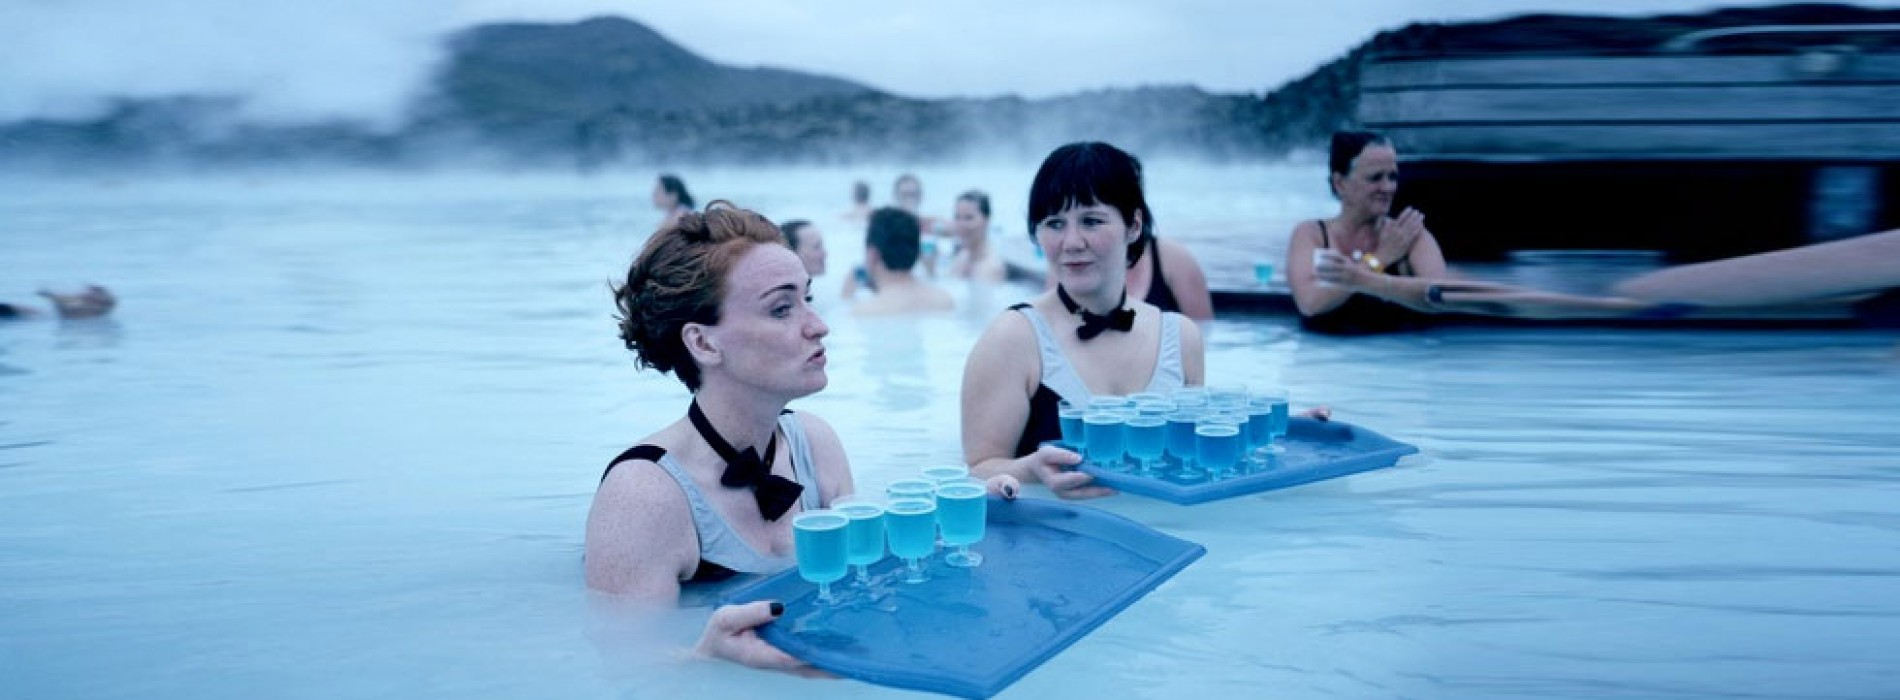 Iceland named 'safest' vacation spot